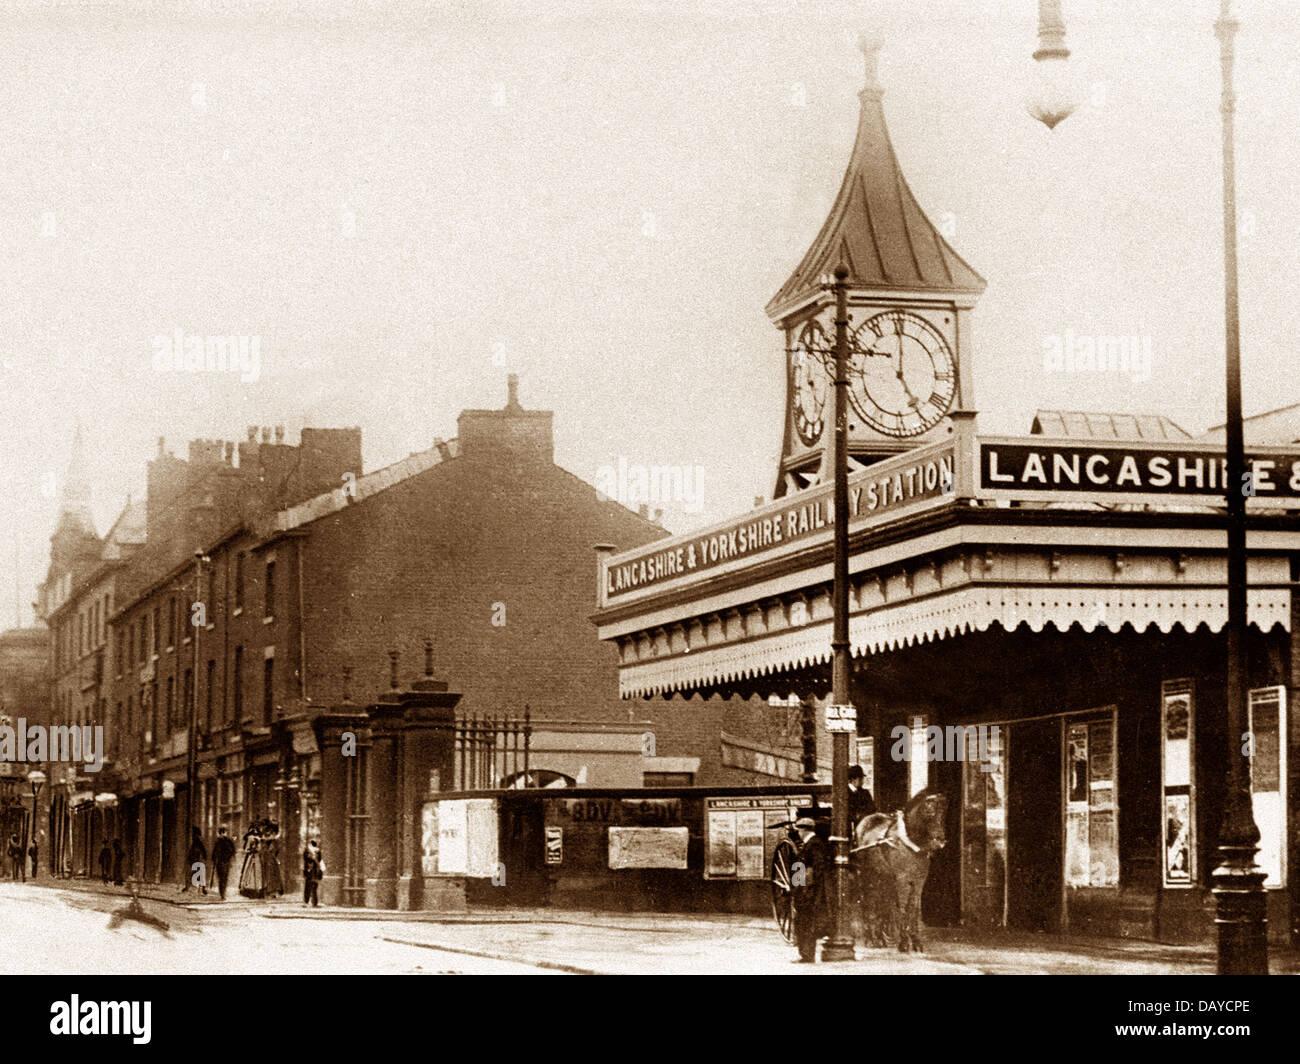 Bury Bolton Street Railway Station early 1900s - Stock Image